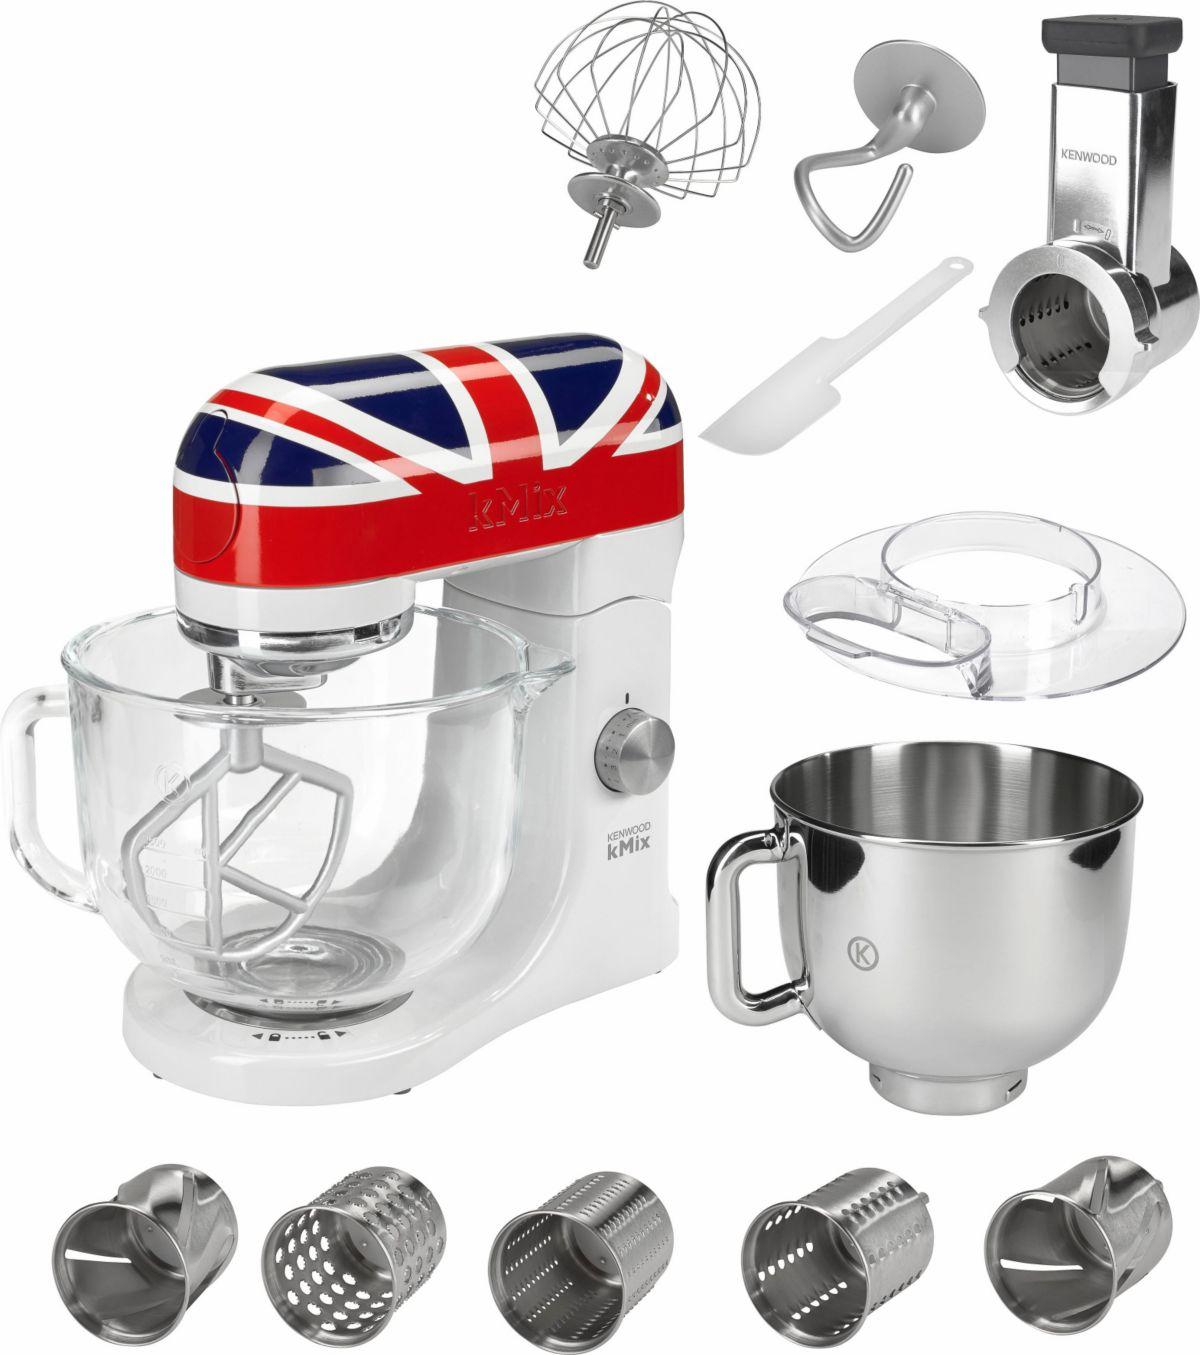 Kenwood Küchenmaschine kMix KMX50UJ - Gratis da...